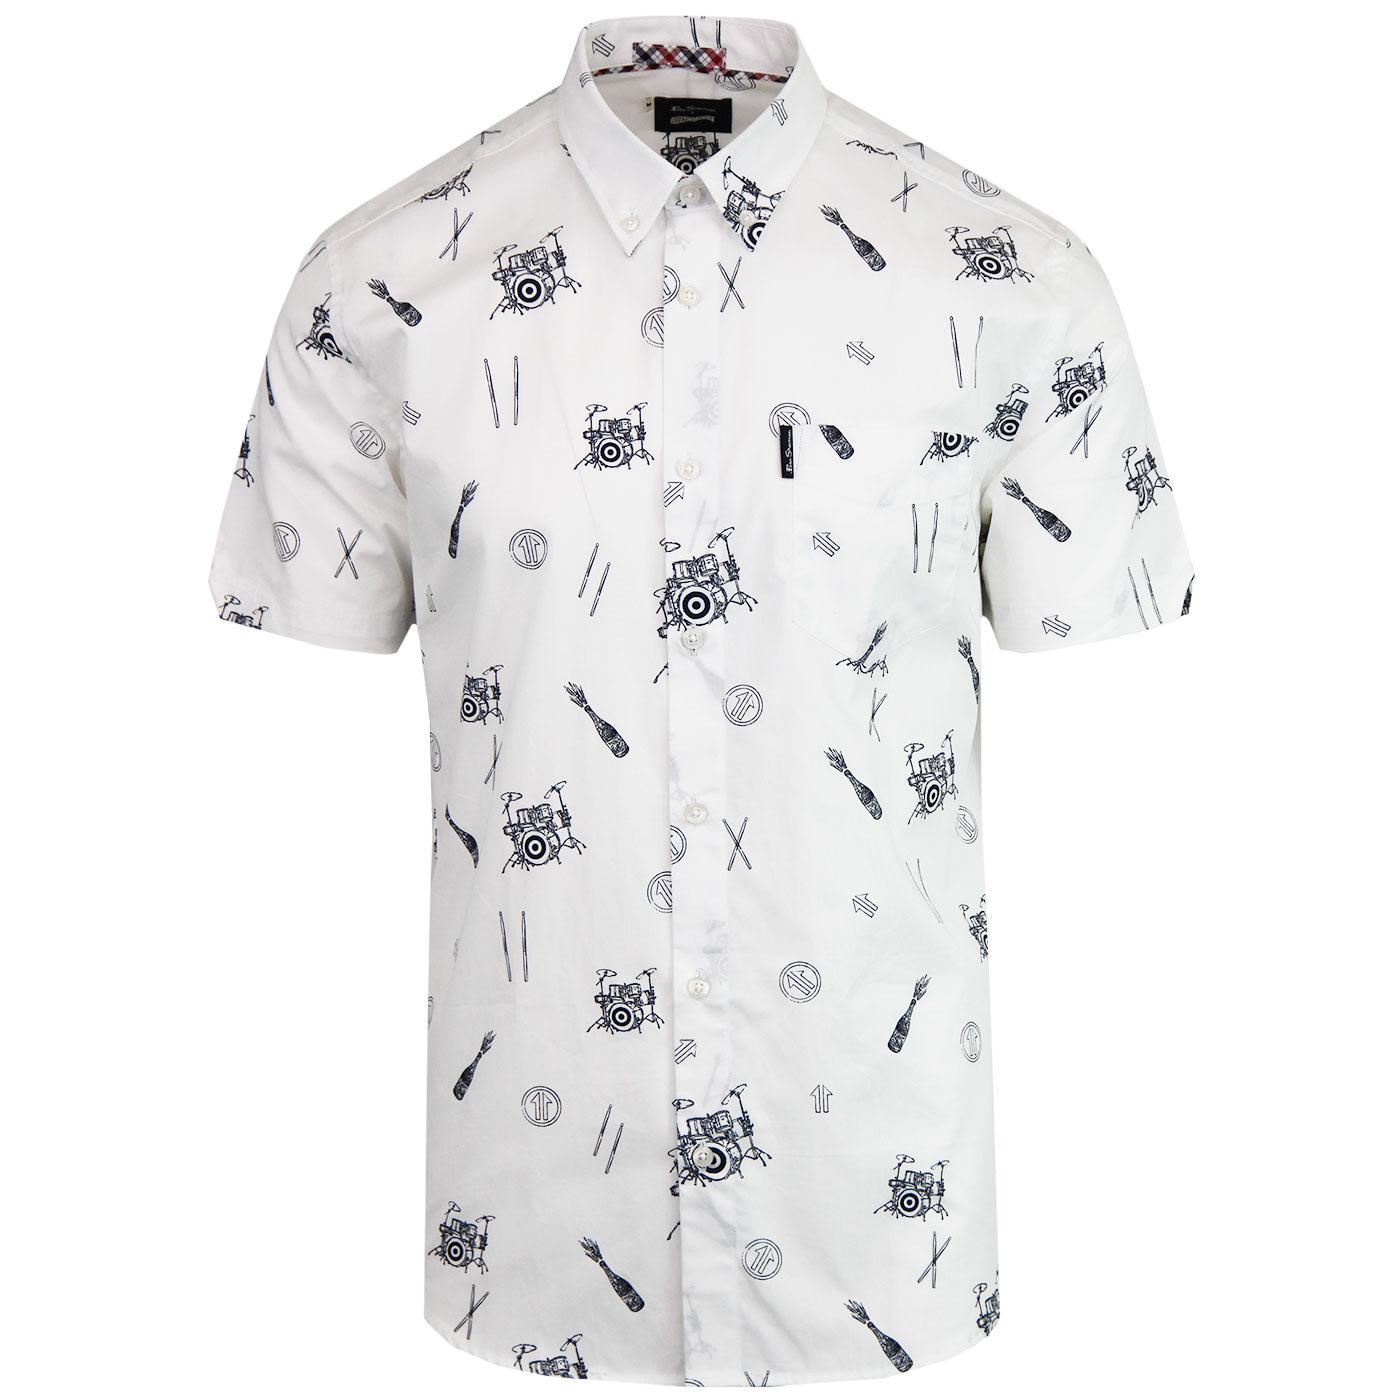 BEN SHERMAN x KEITH MOON Ltd Ed Mod Icon Shirt